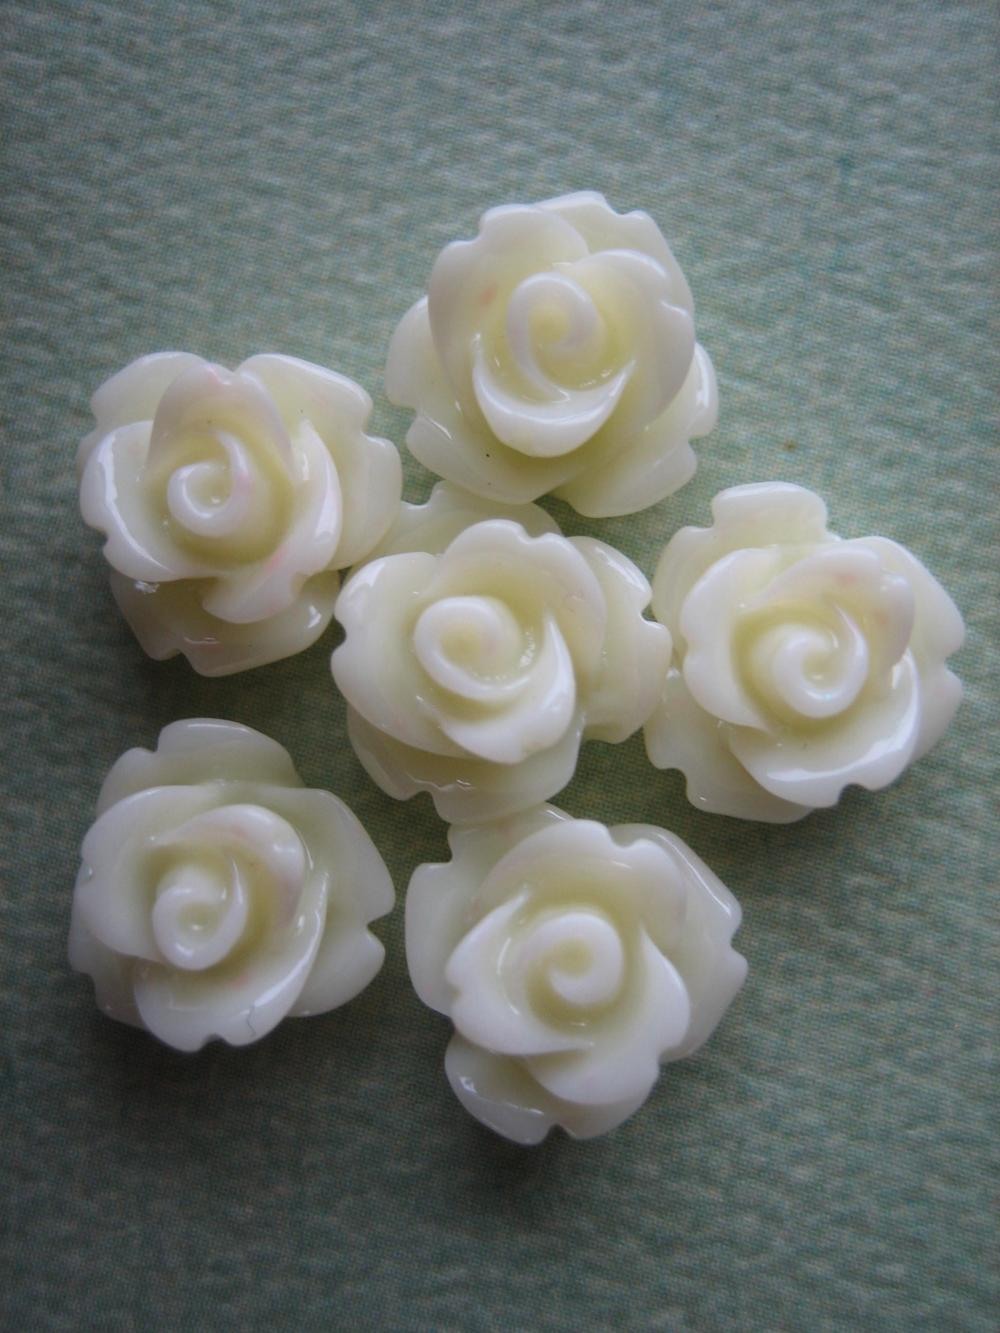 6PCS - Mini Rose Flower Cabochons - 10mm - Resin - Vanilla - Cabochons by ZARDENIA